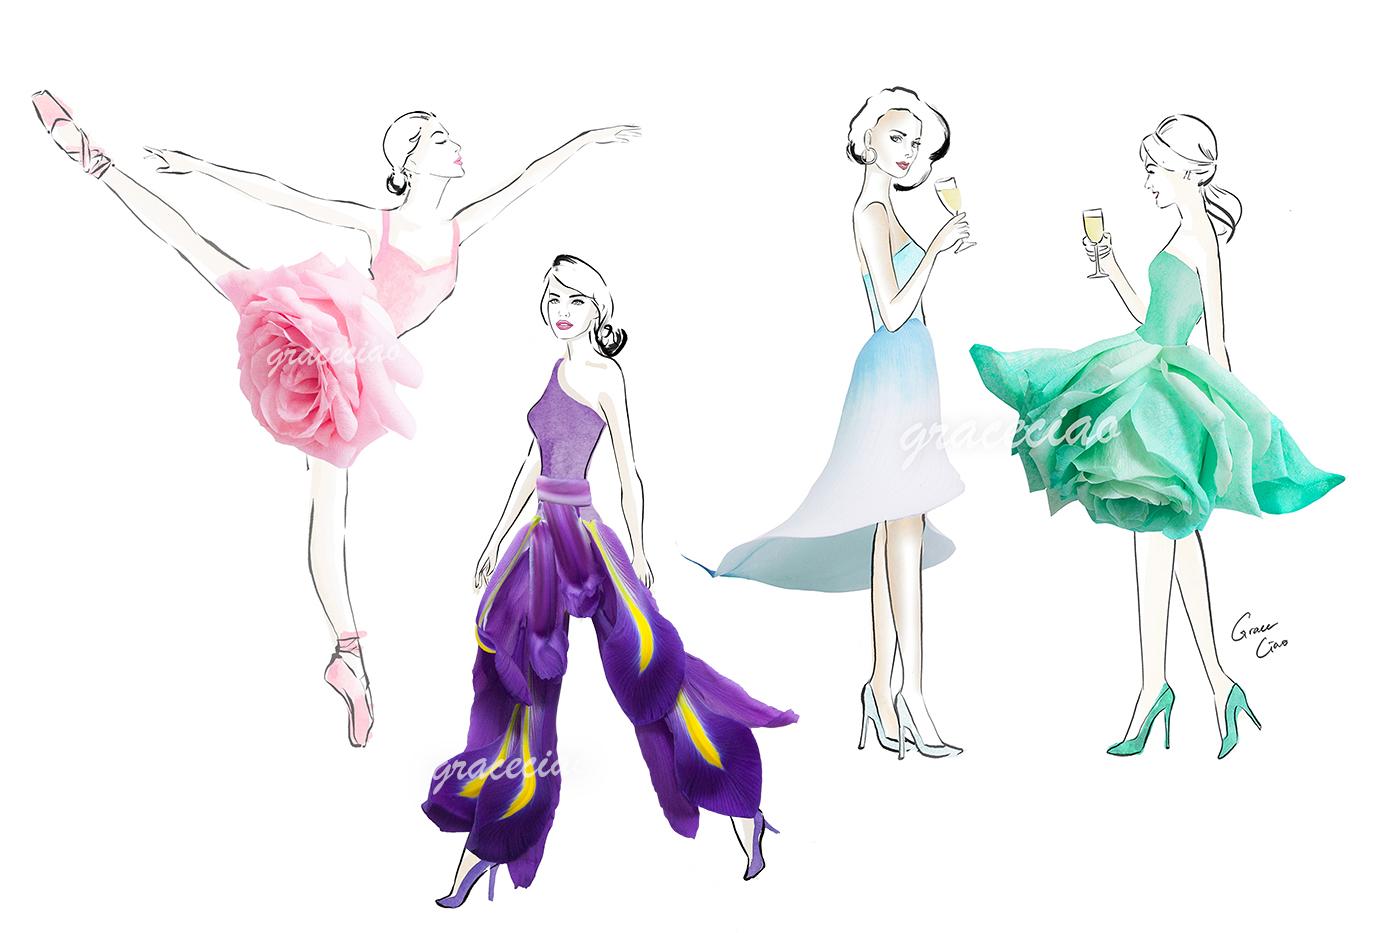 illustrator-grace-ciao-flower-fashion-art-petals-illustration-commercial.jpg